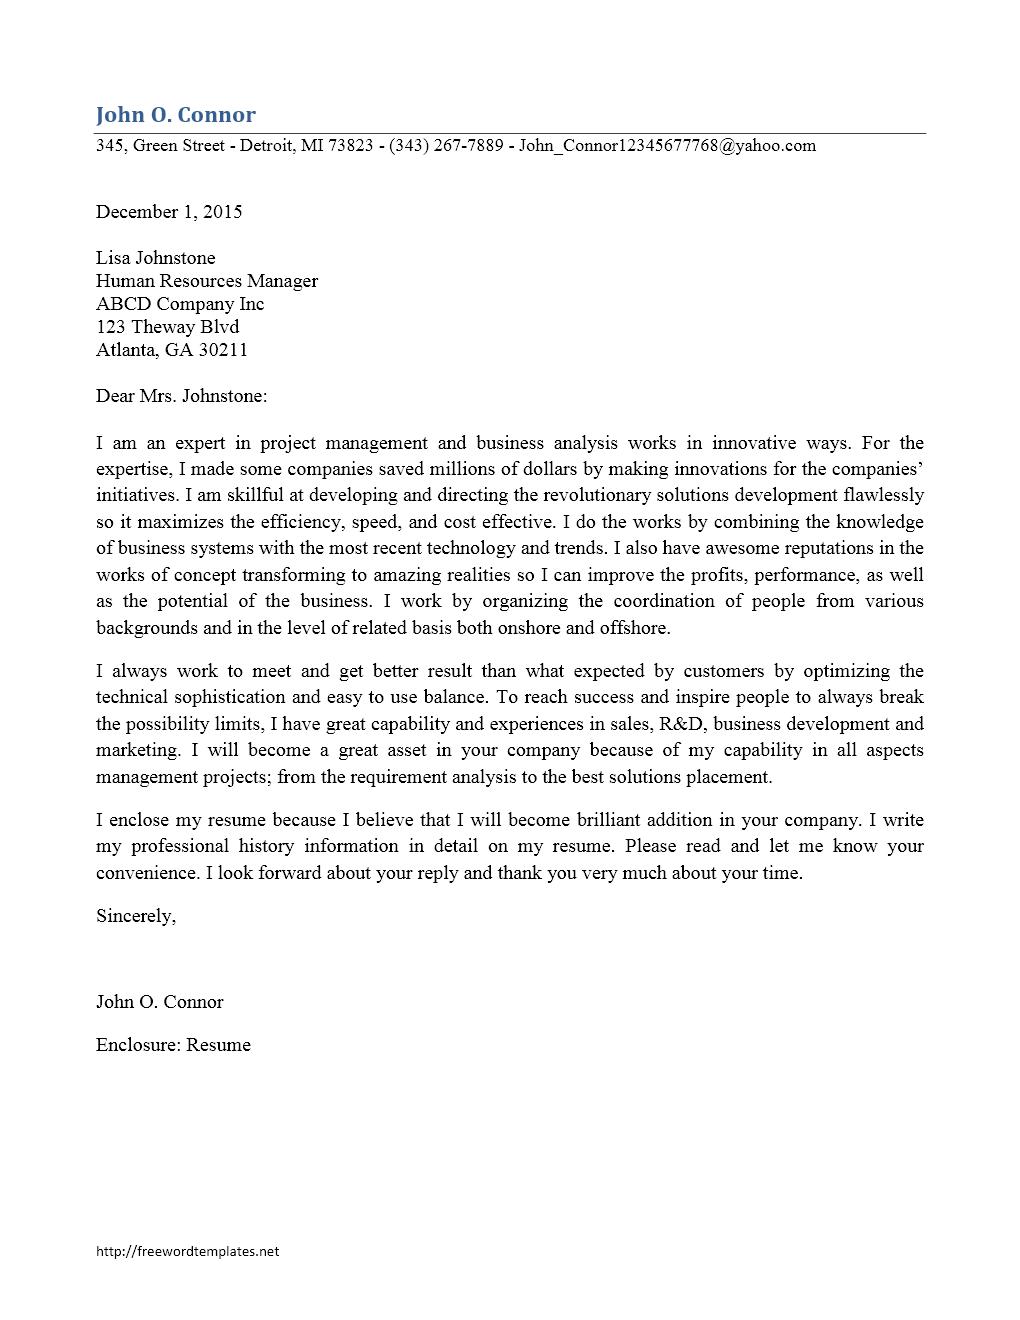 Protect correspondence